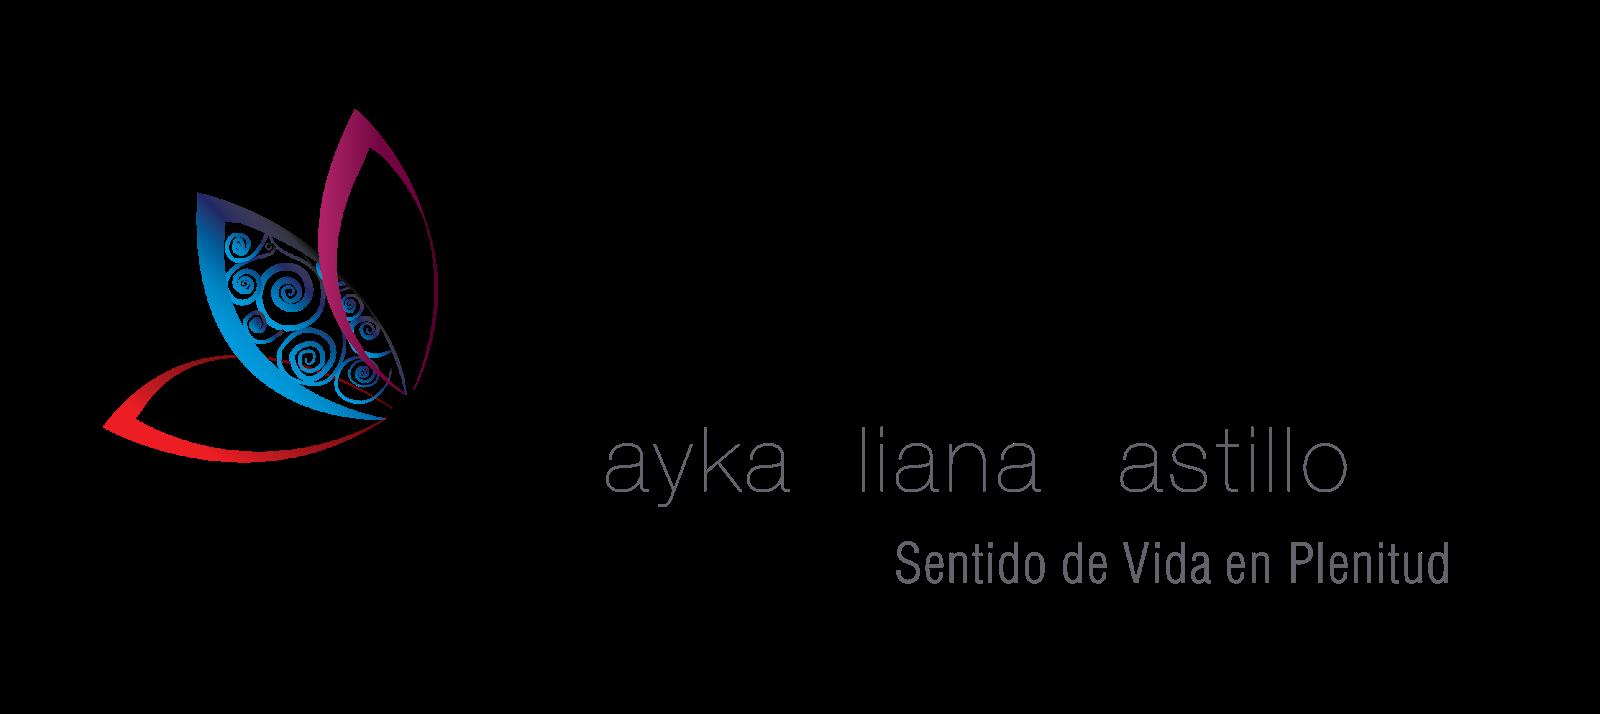 Mayka Eeliana Castillo